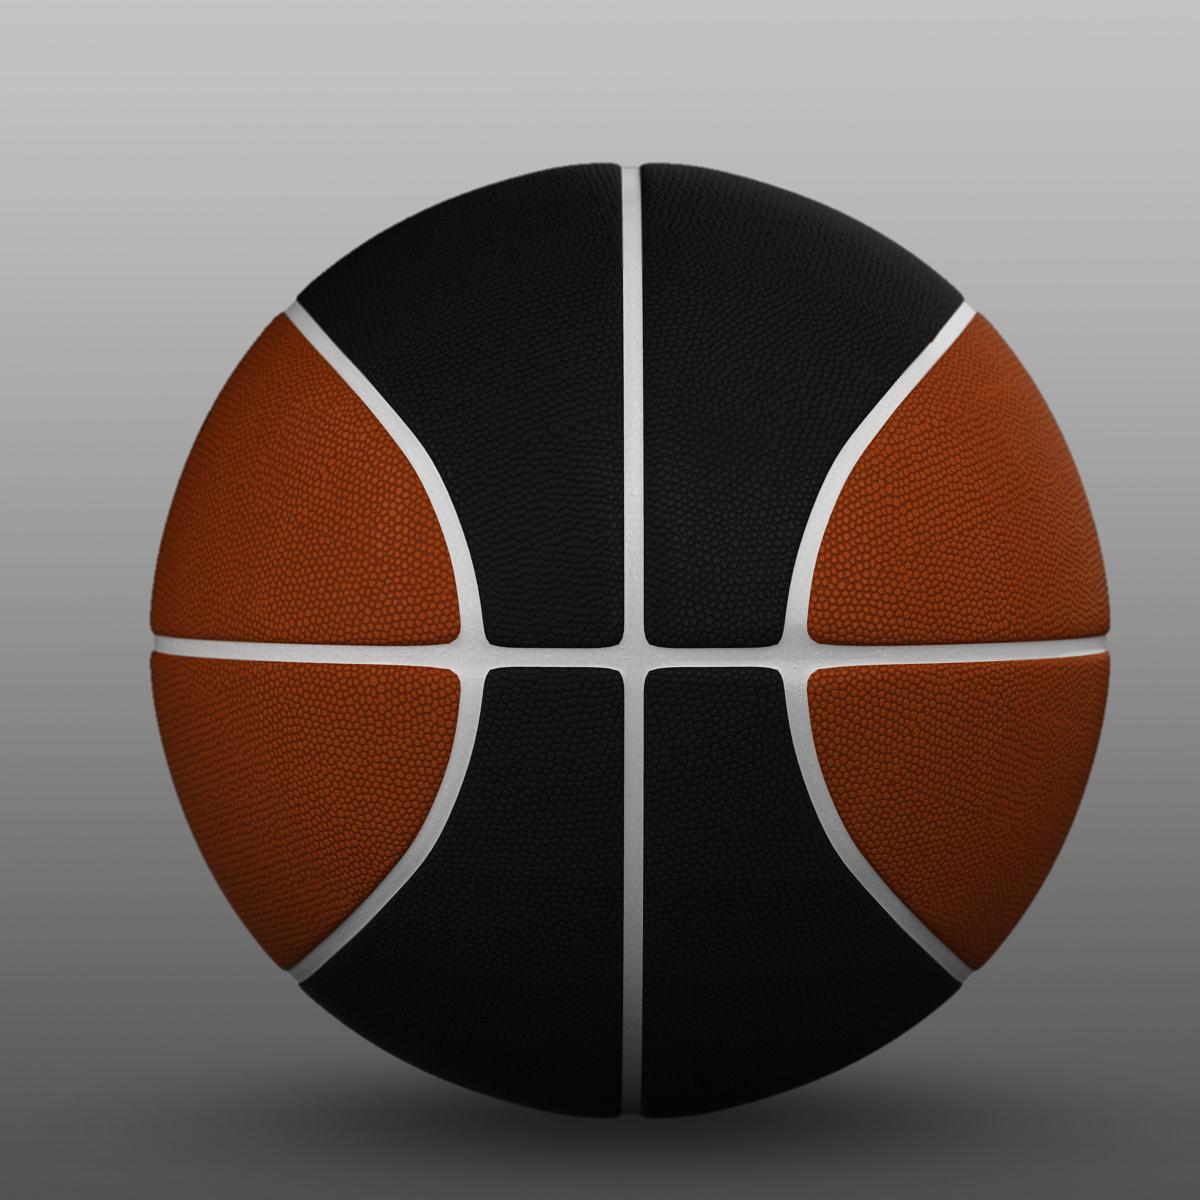 standard basketball ball 3d model 3ds max fbx c4d ma mb obj 164714